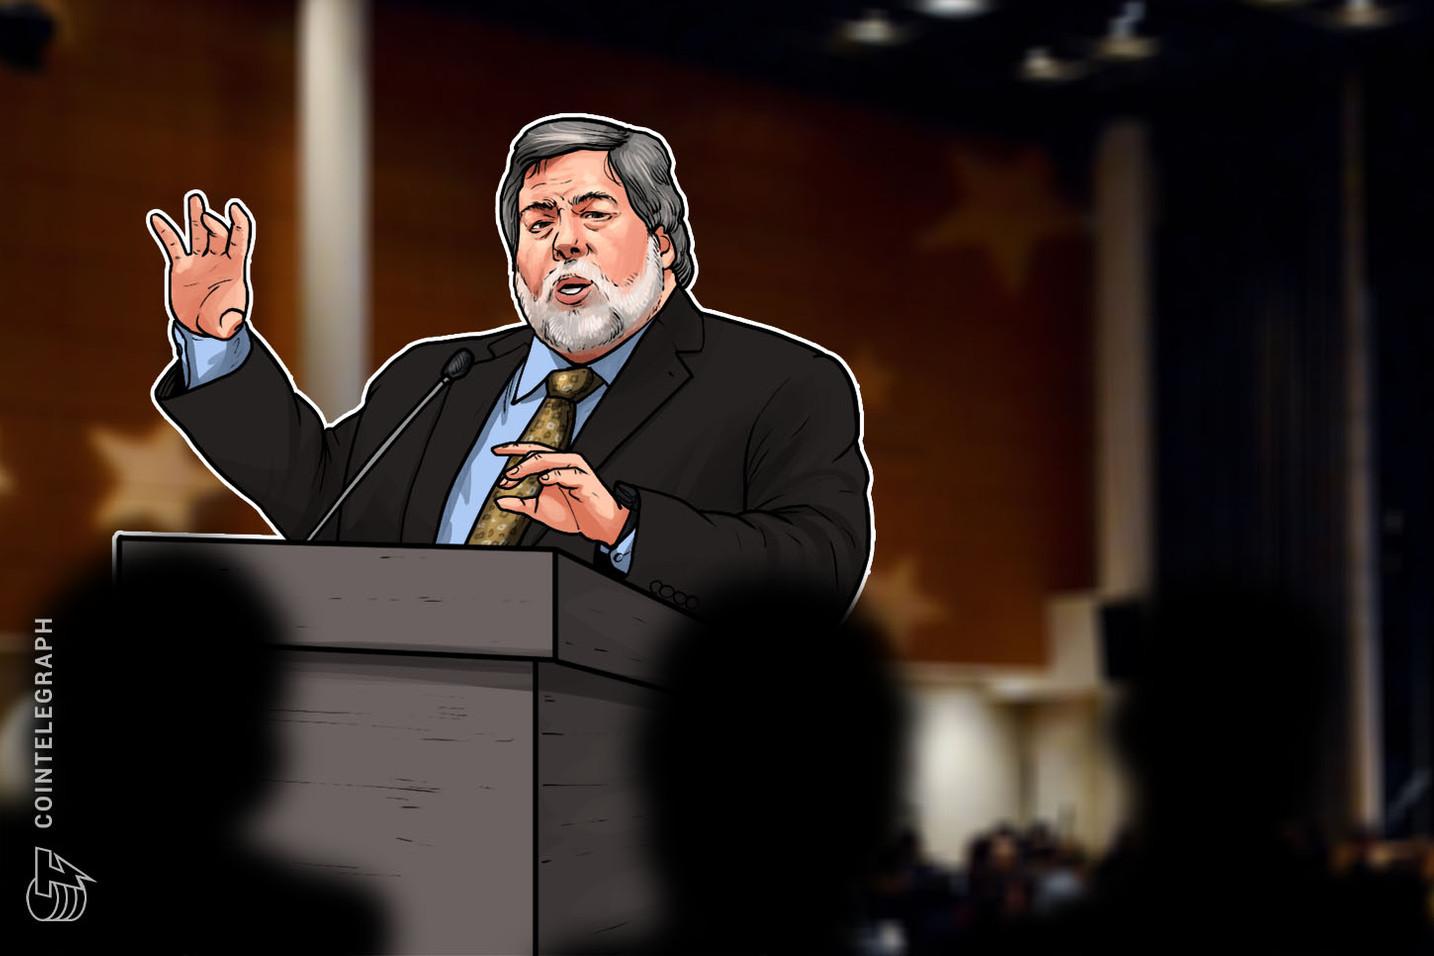 Apple's Steve Wozniak Calls Blockchain a 'Bubble,' Thinks Bitcoin Is Still 'Just Amazing'